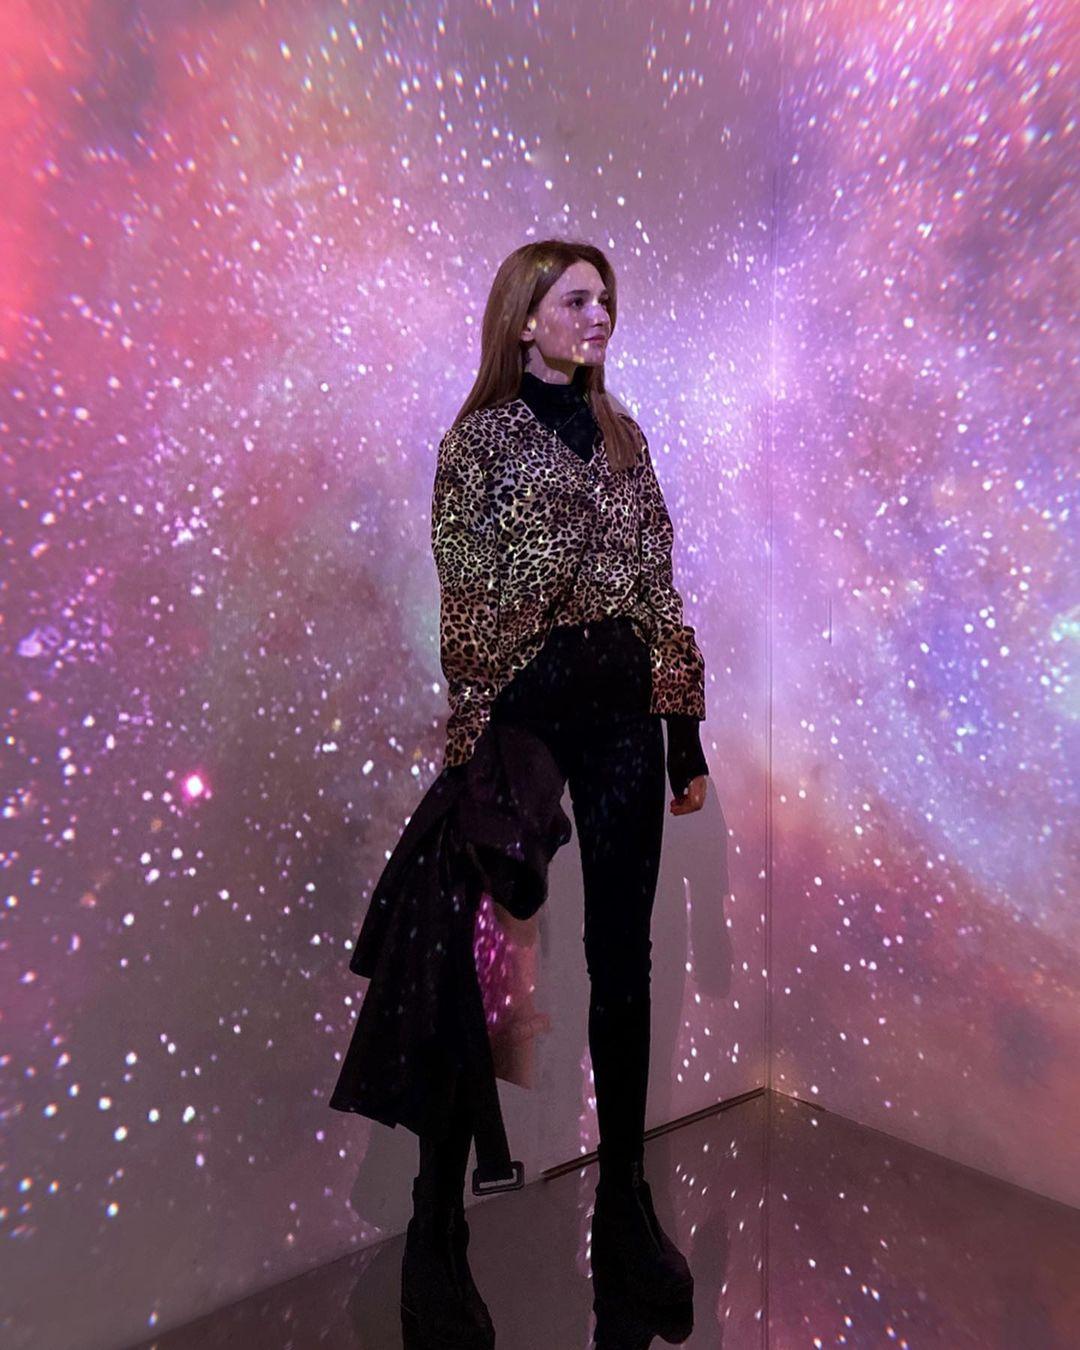 Anastasia-Jung-Wallpapers-Insta-Fit-Bio-6